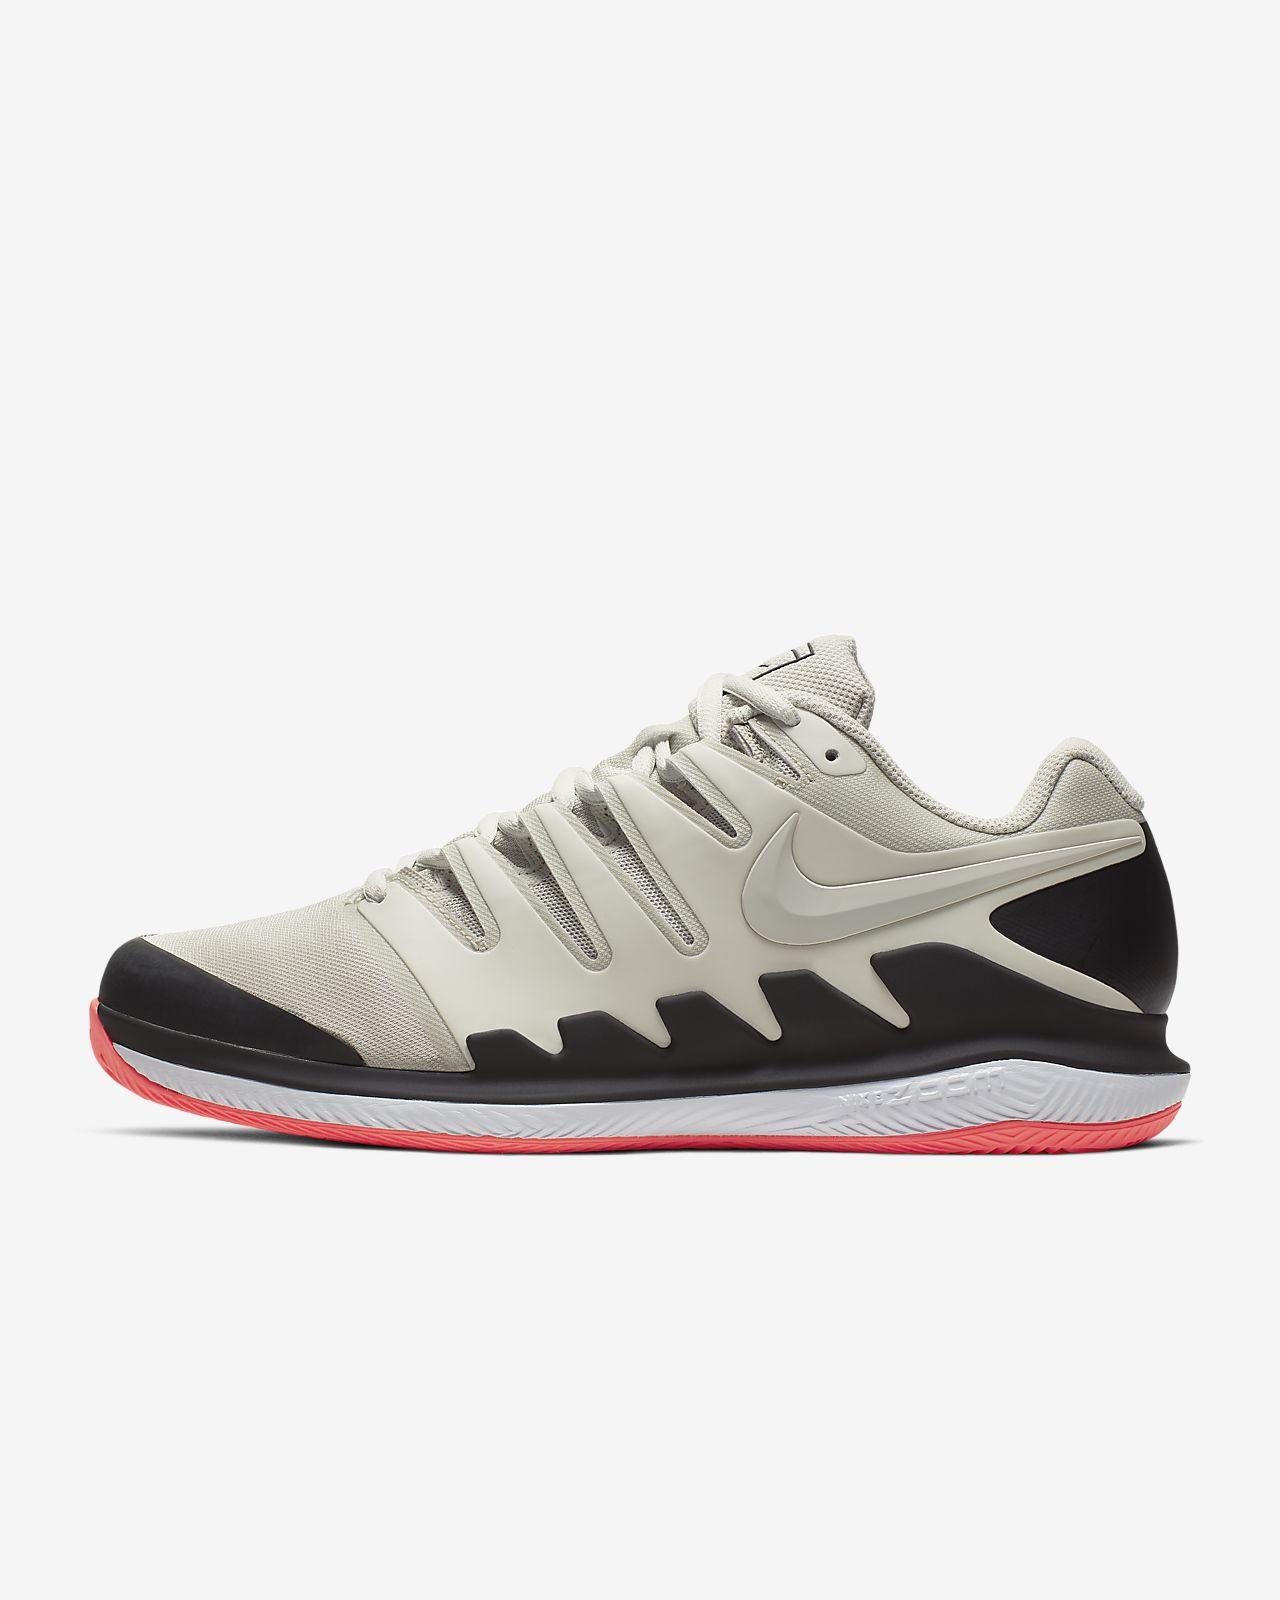 NikeCourt Air Zoom Vapor X-tennissko til grusbanen til mænd